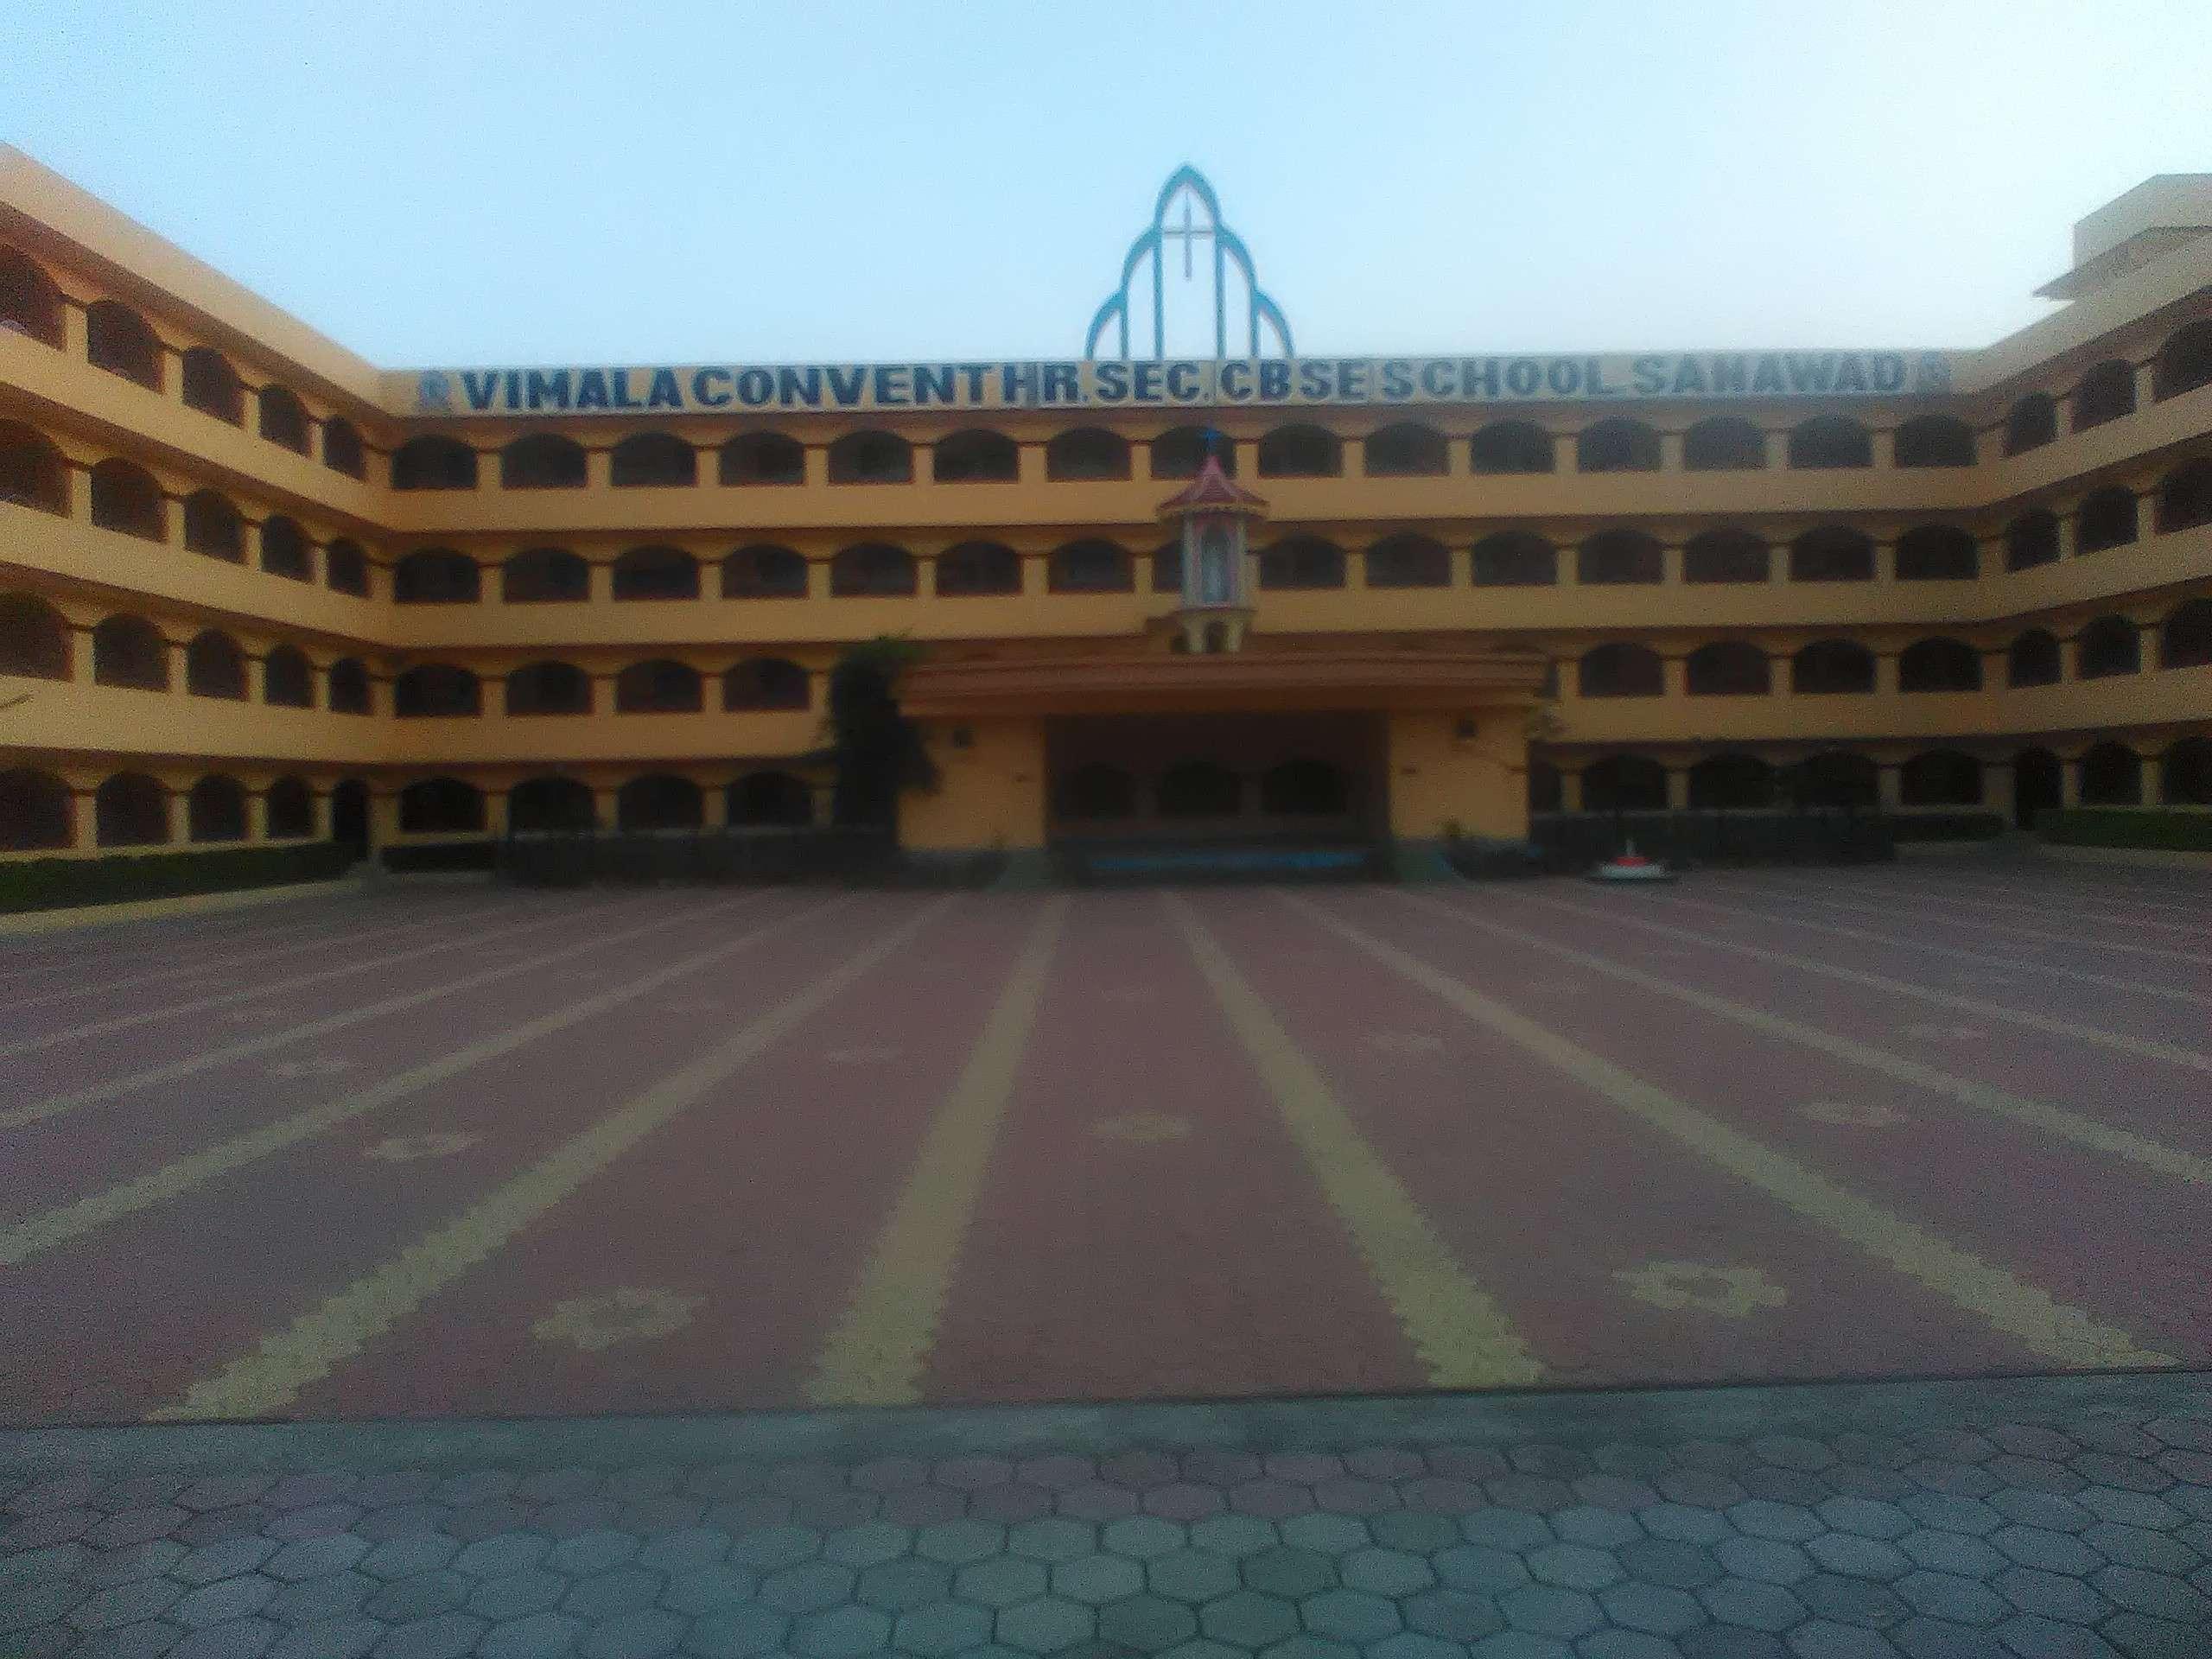 VIMLA CONVENT HR SEC SCHOOL SANAWAD KHARGAON MP 1030234